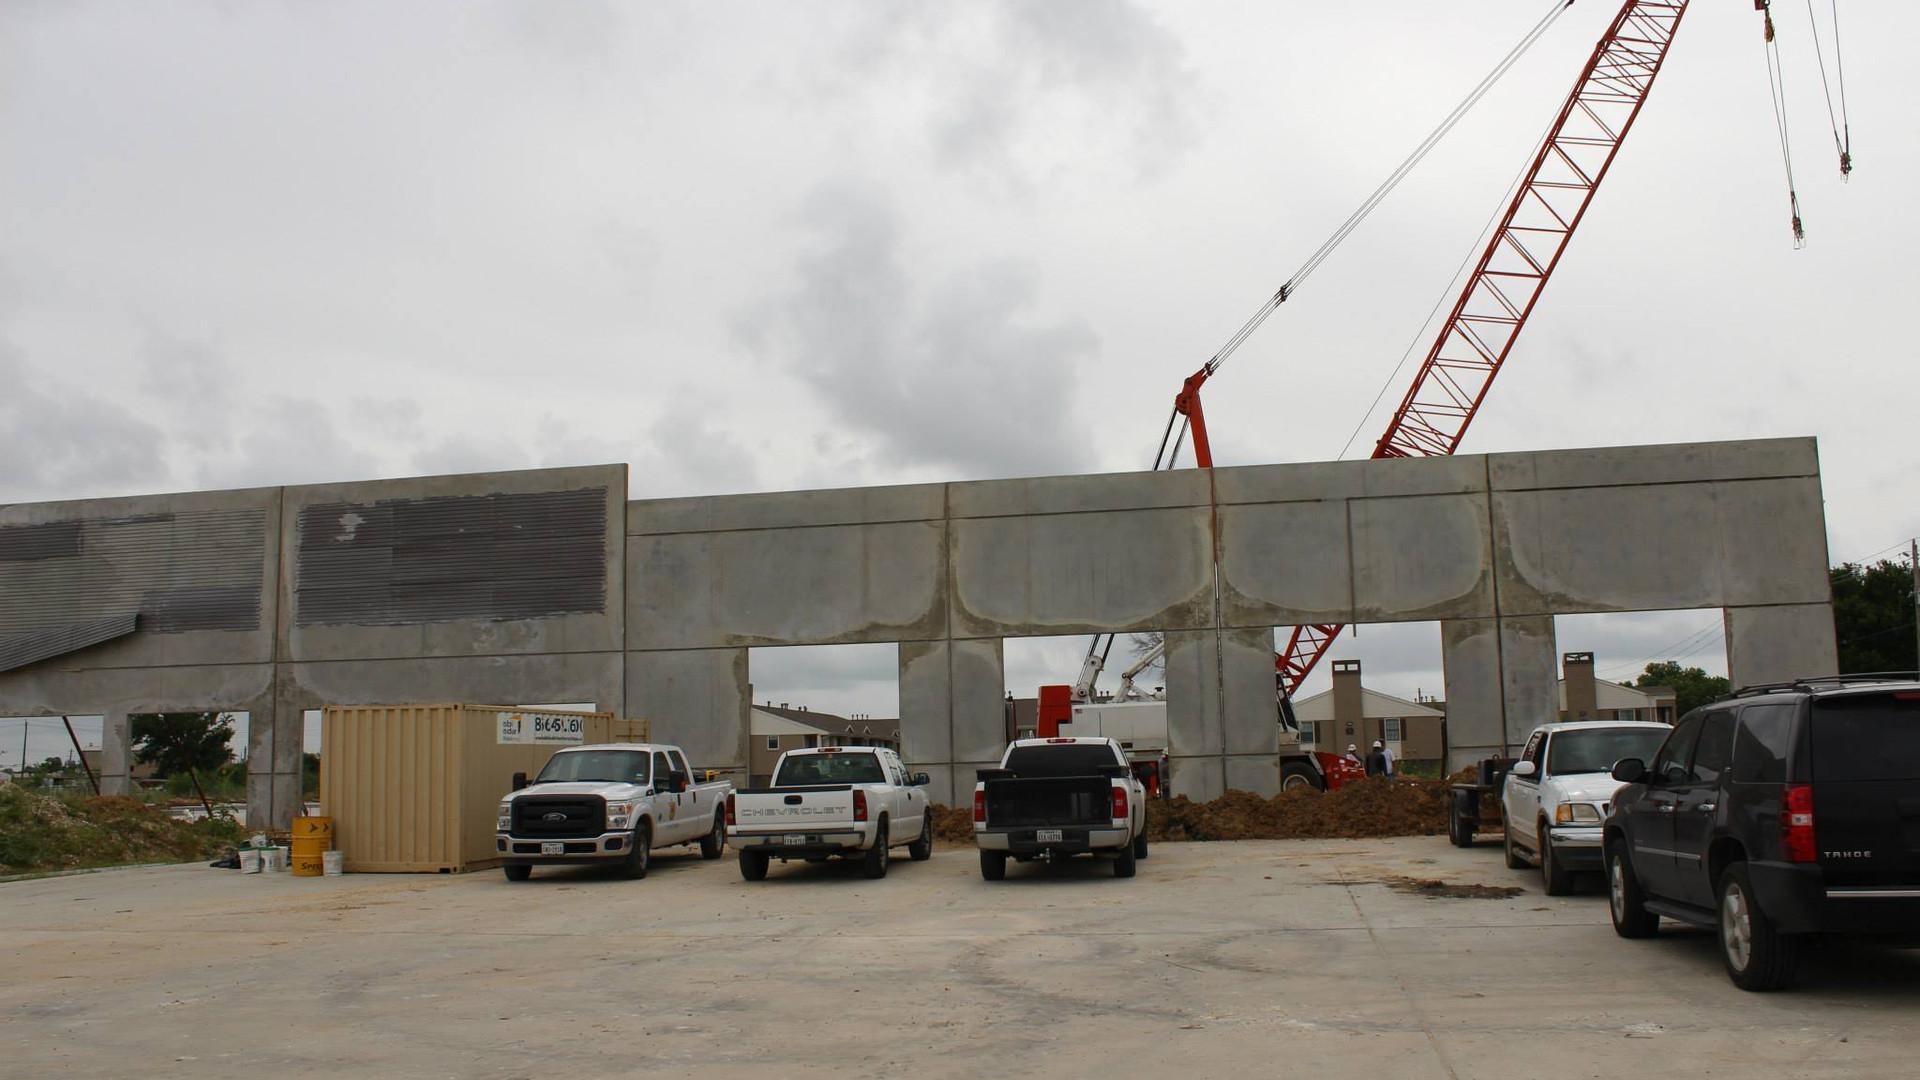 9191 Gulf Freeway walls going up